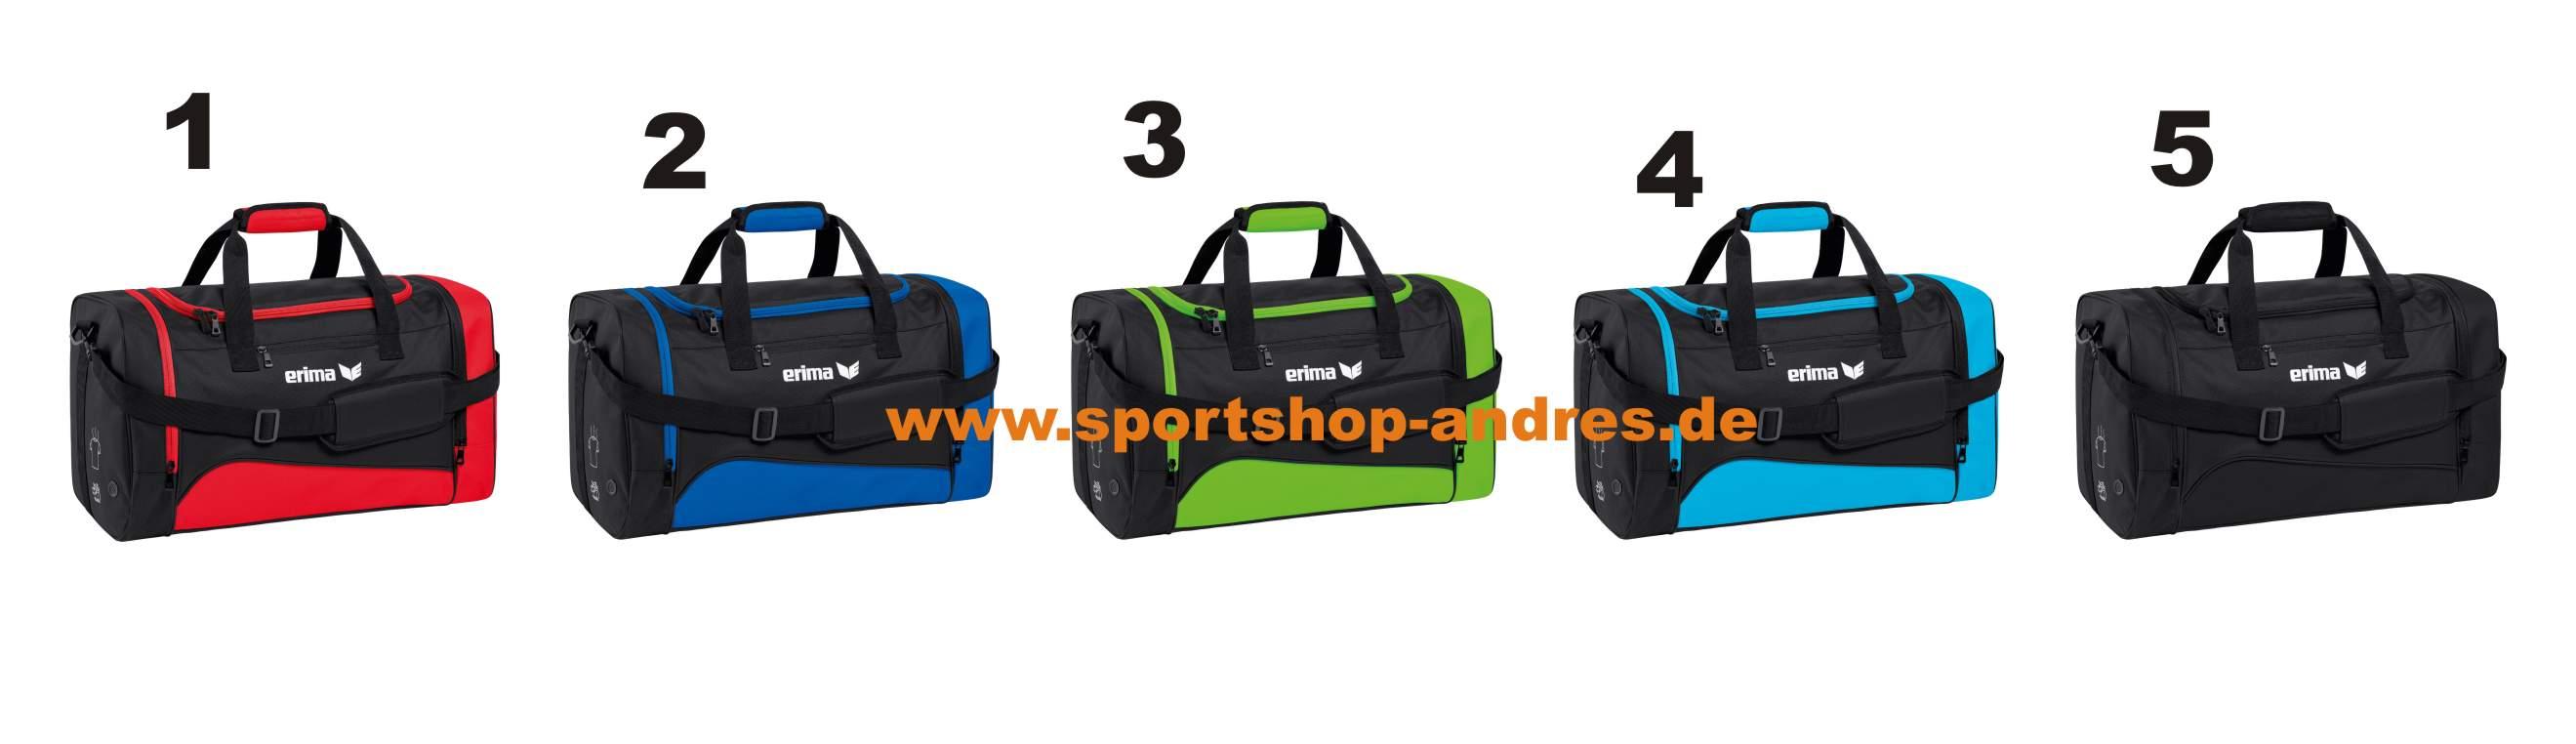 6ef58e8ac073a Sportshop Andres - Erima Sporttasche Club 1900 2.0 Größe M schon ab ...